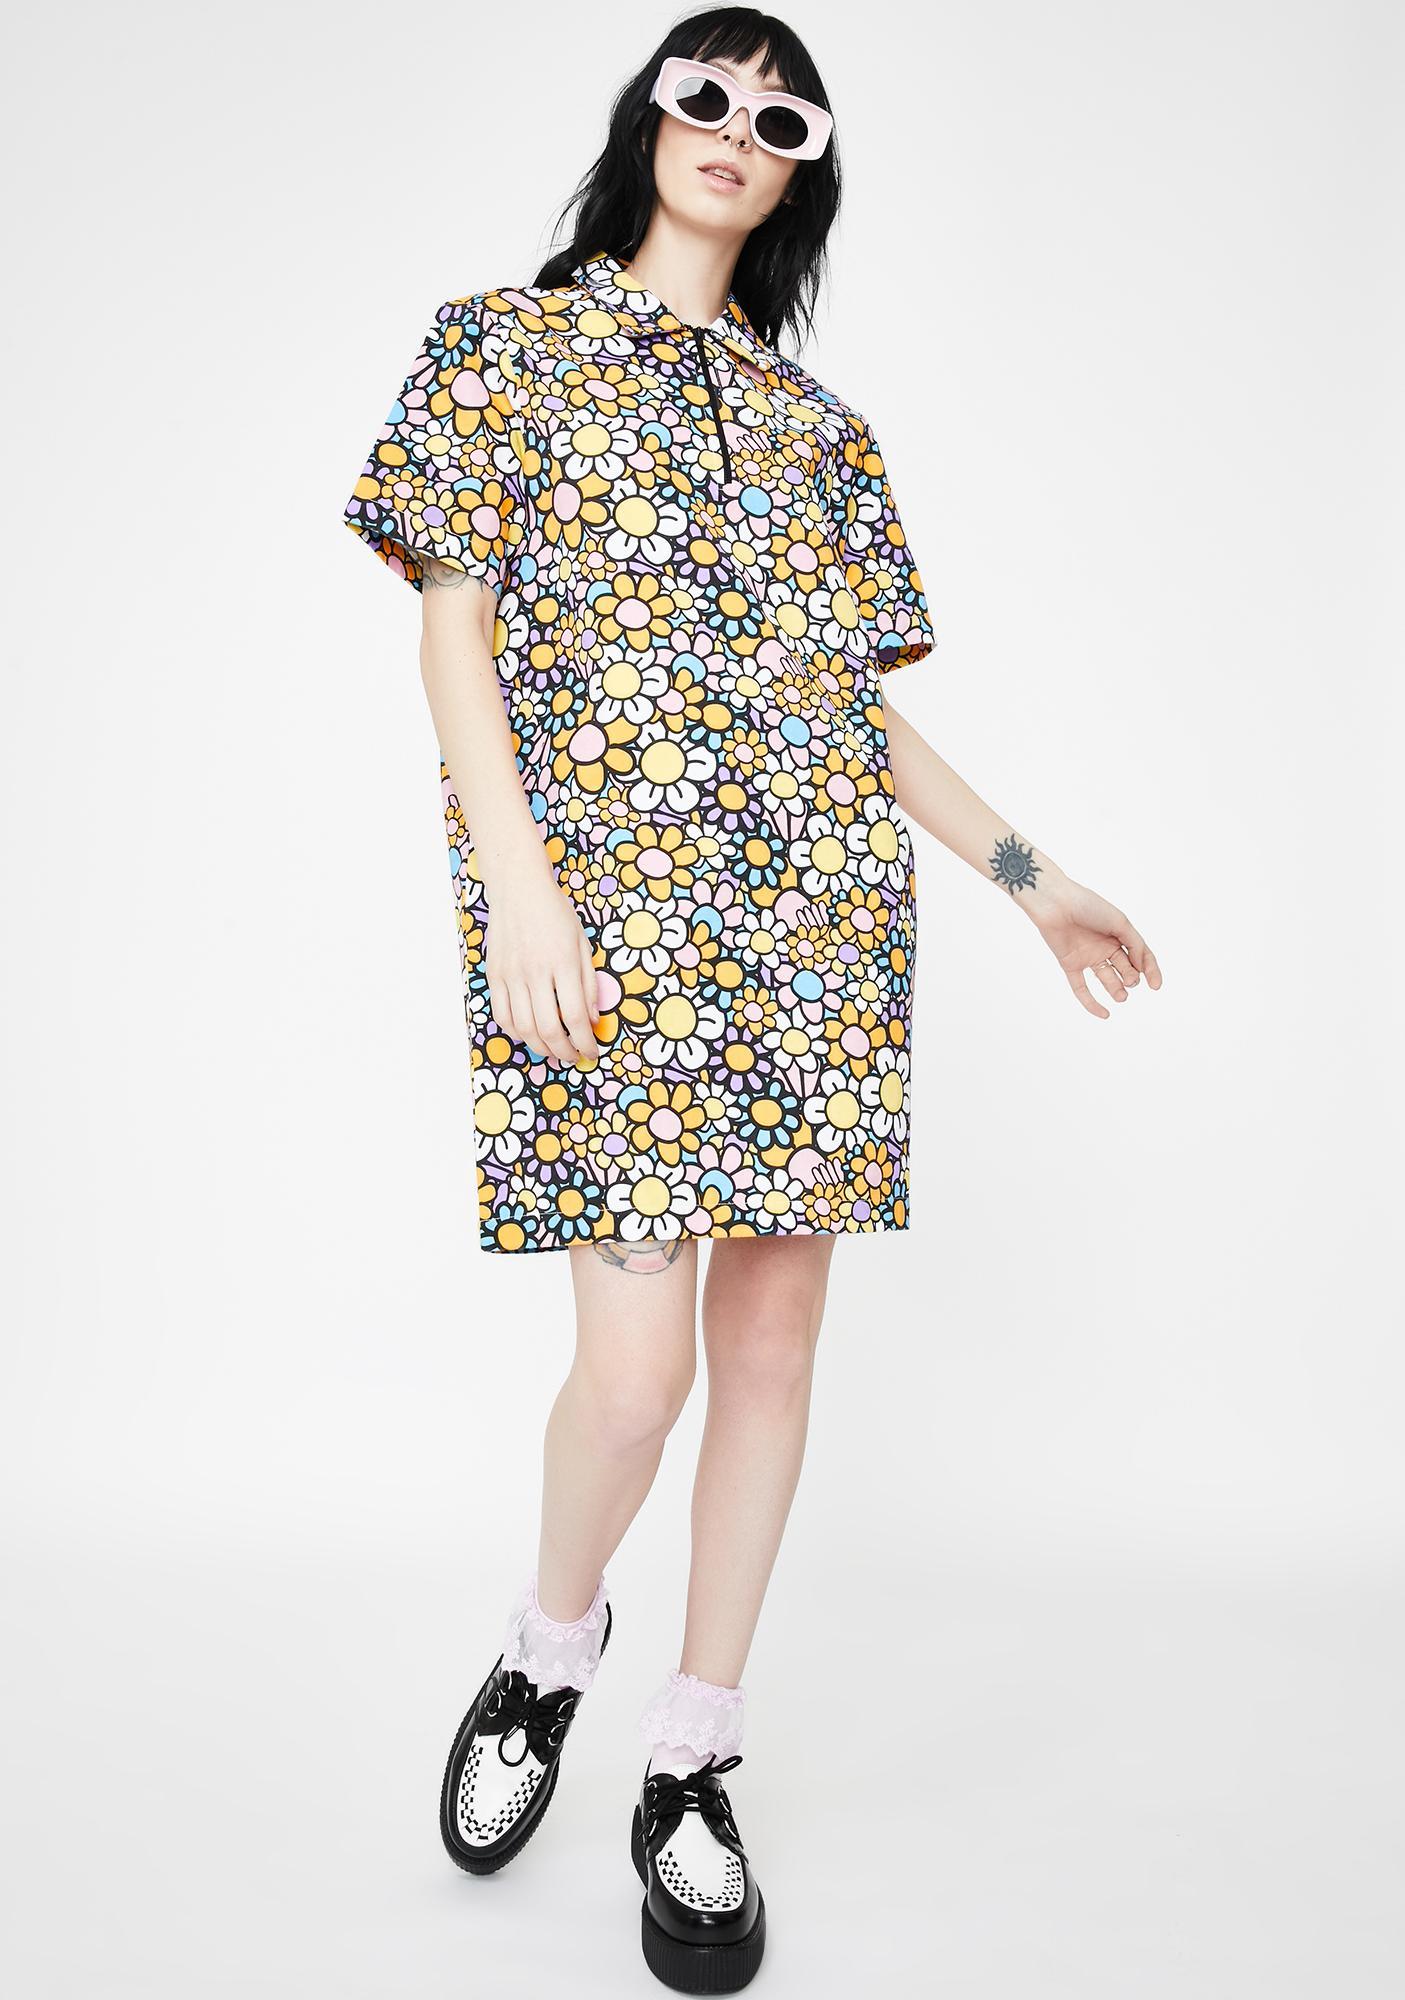 Lazy Oaf In Bloom Zippy Shirt Dress